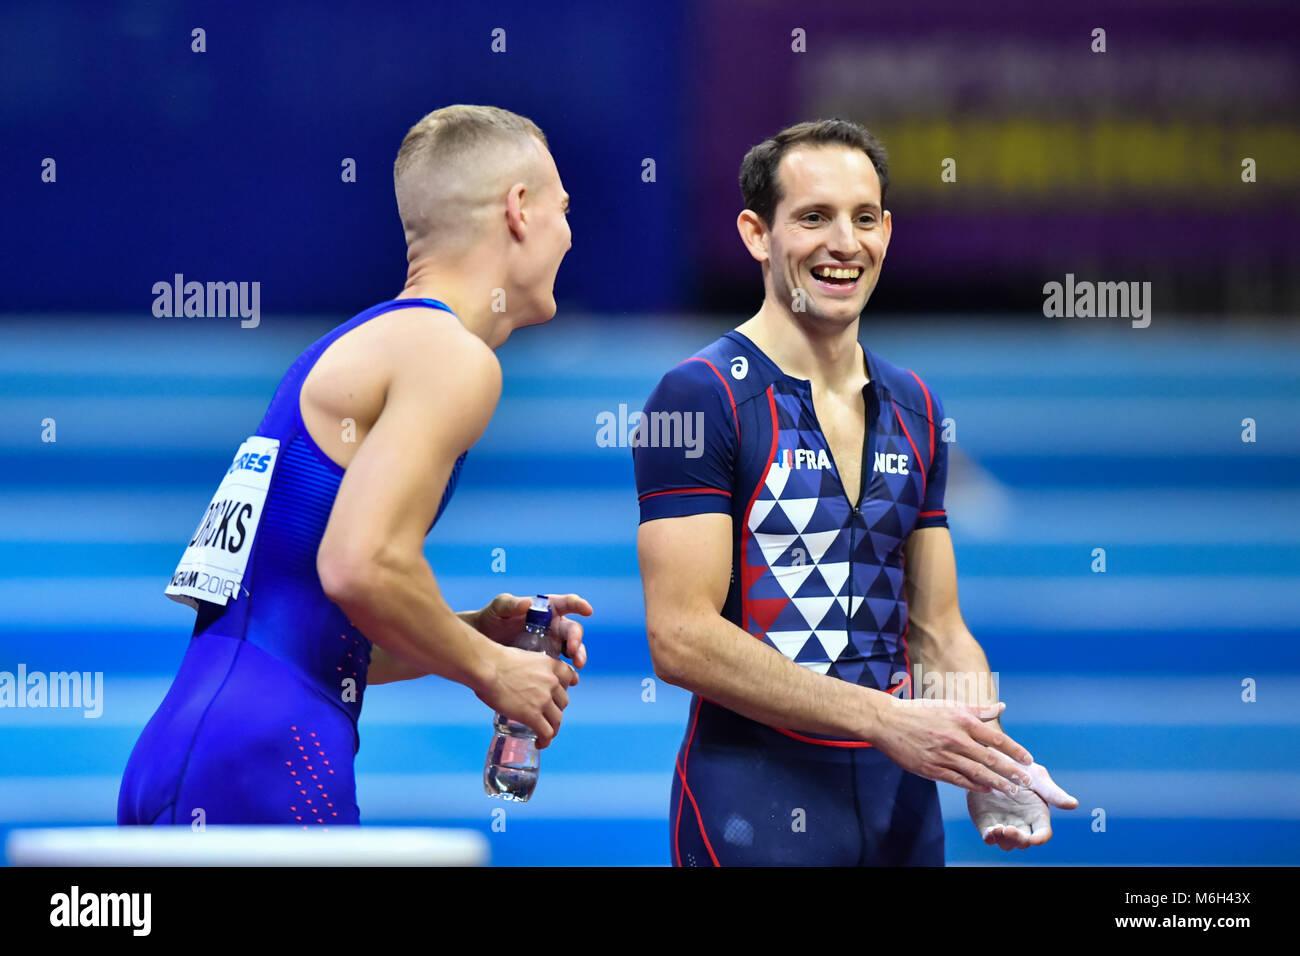 Birmingham, UK. 4th Mar, 2018. Axel Chapelle (FRA) Sam Kendricks (USA) in Men's Pole Vault Final during IAAF - Stock Image